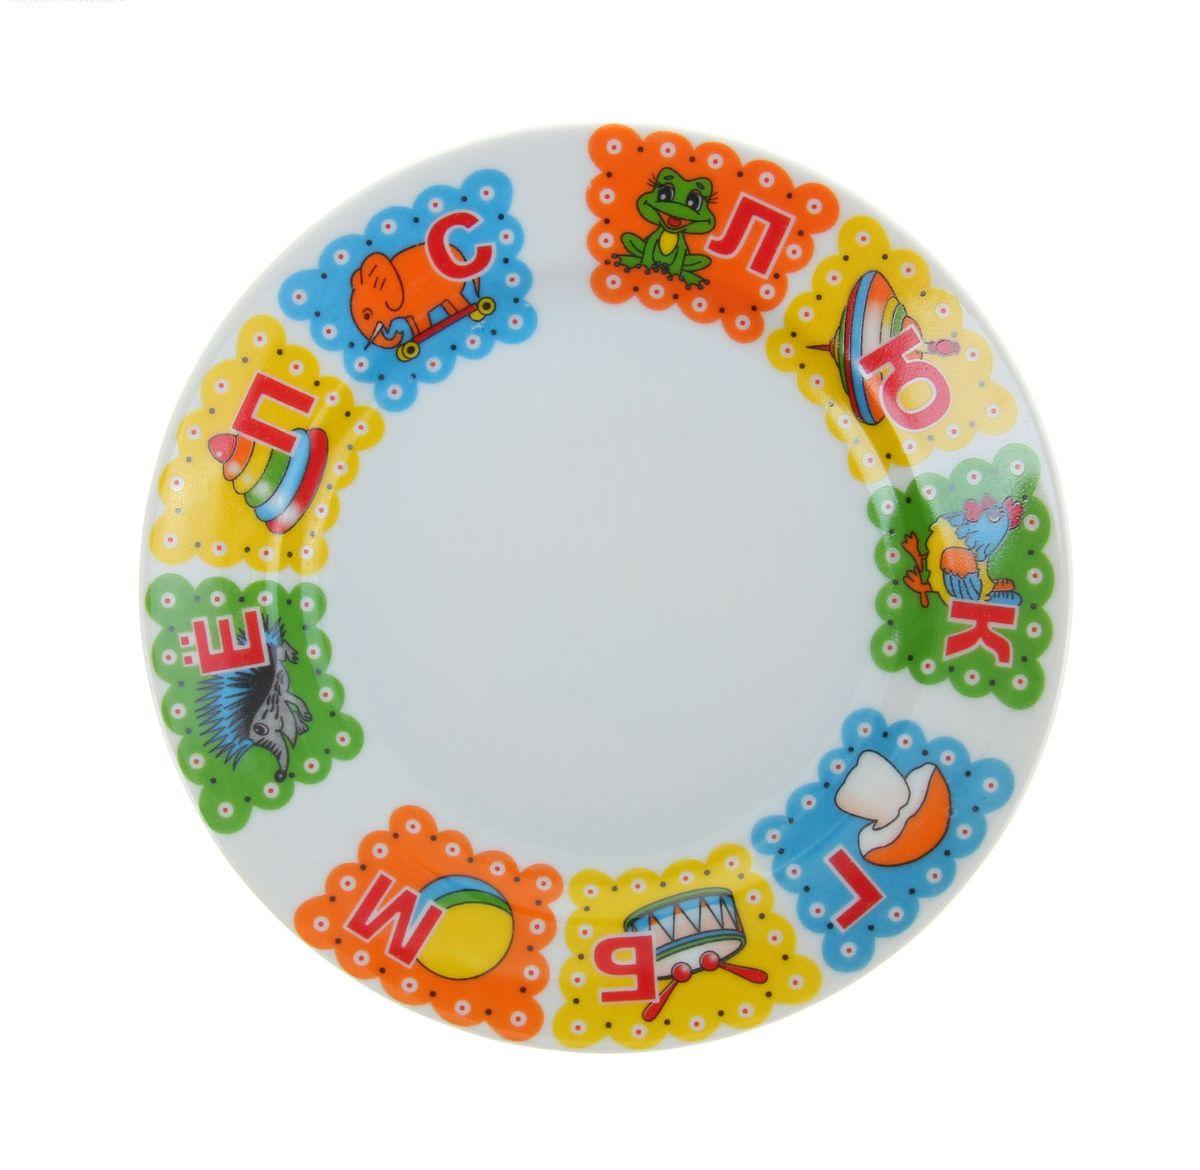 Тарелка мелкая Идиллия. Азбука, диаметр 17 см1035478